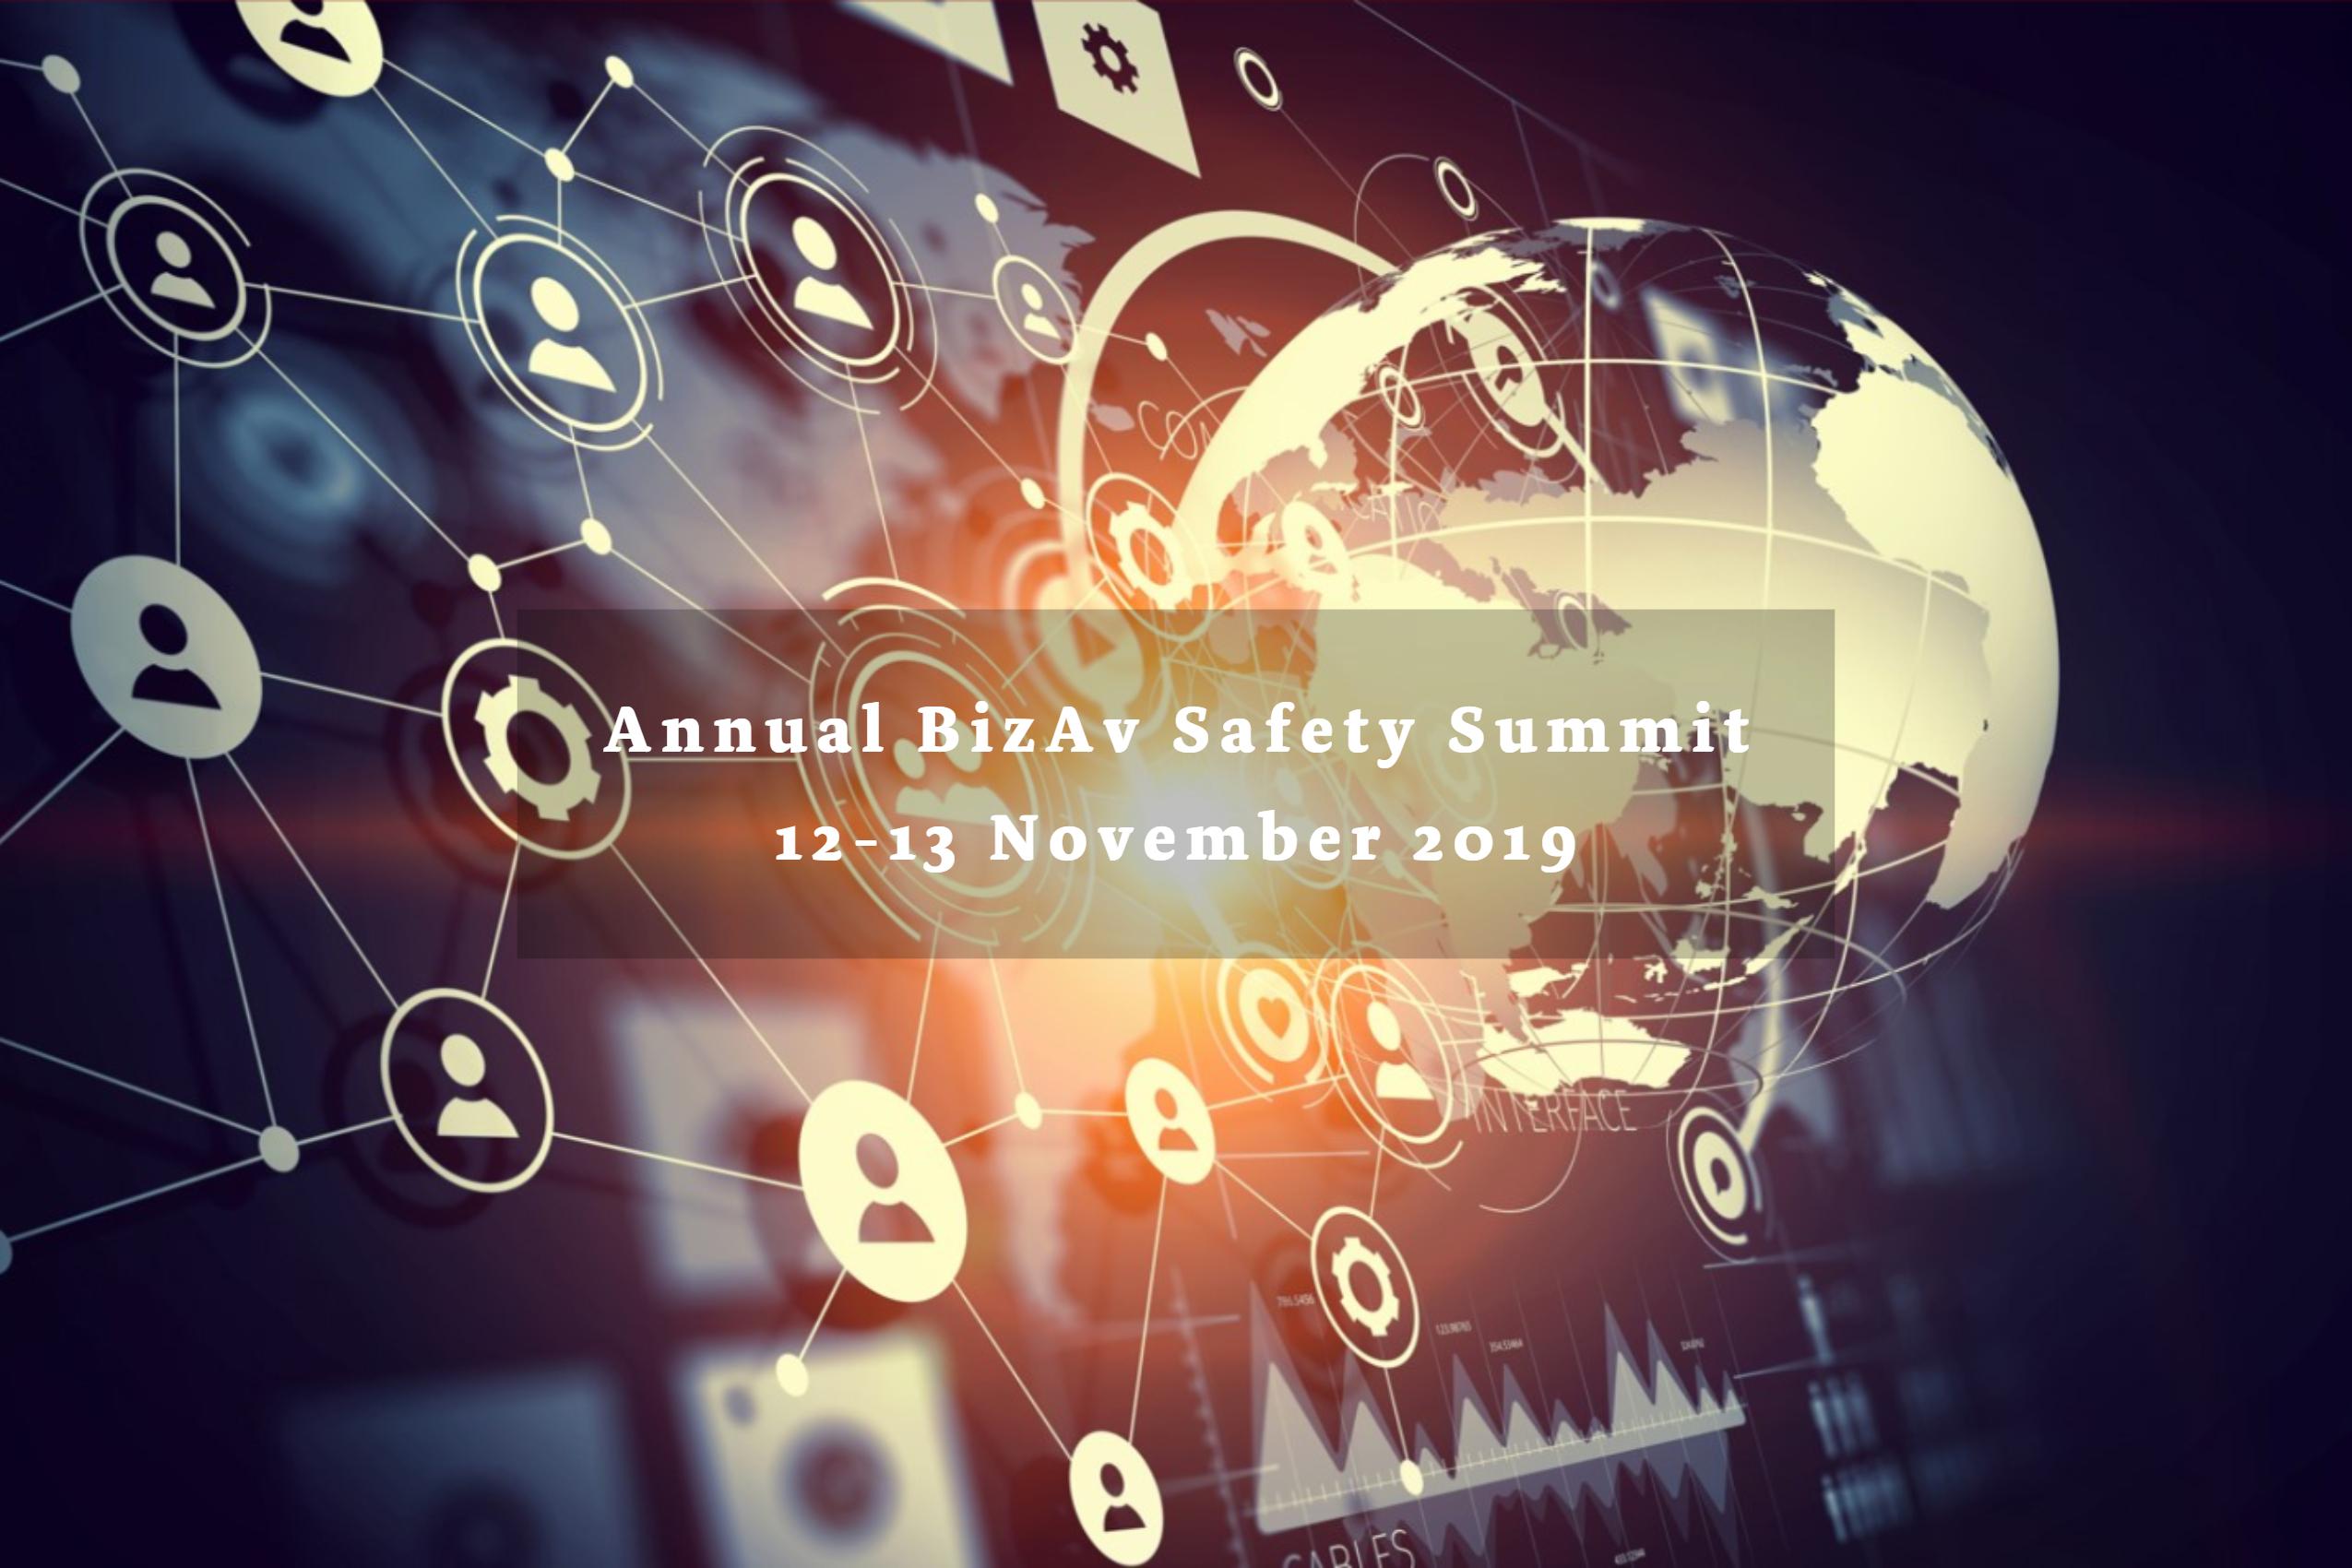 Annual BizAv Safety Summit 2019